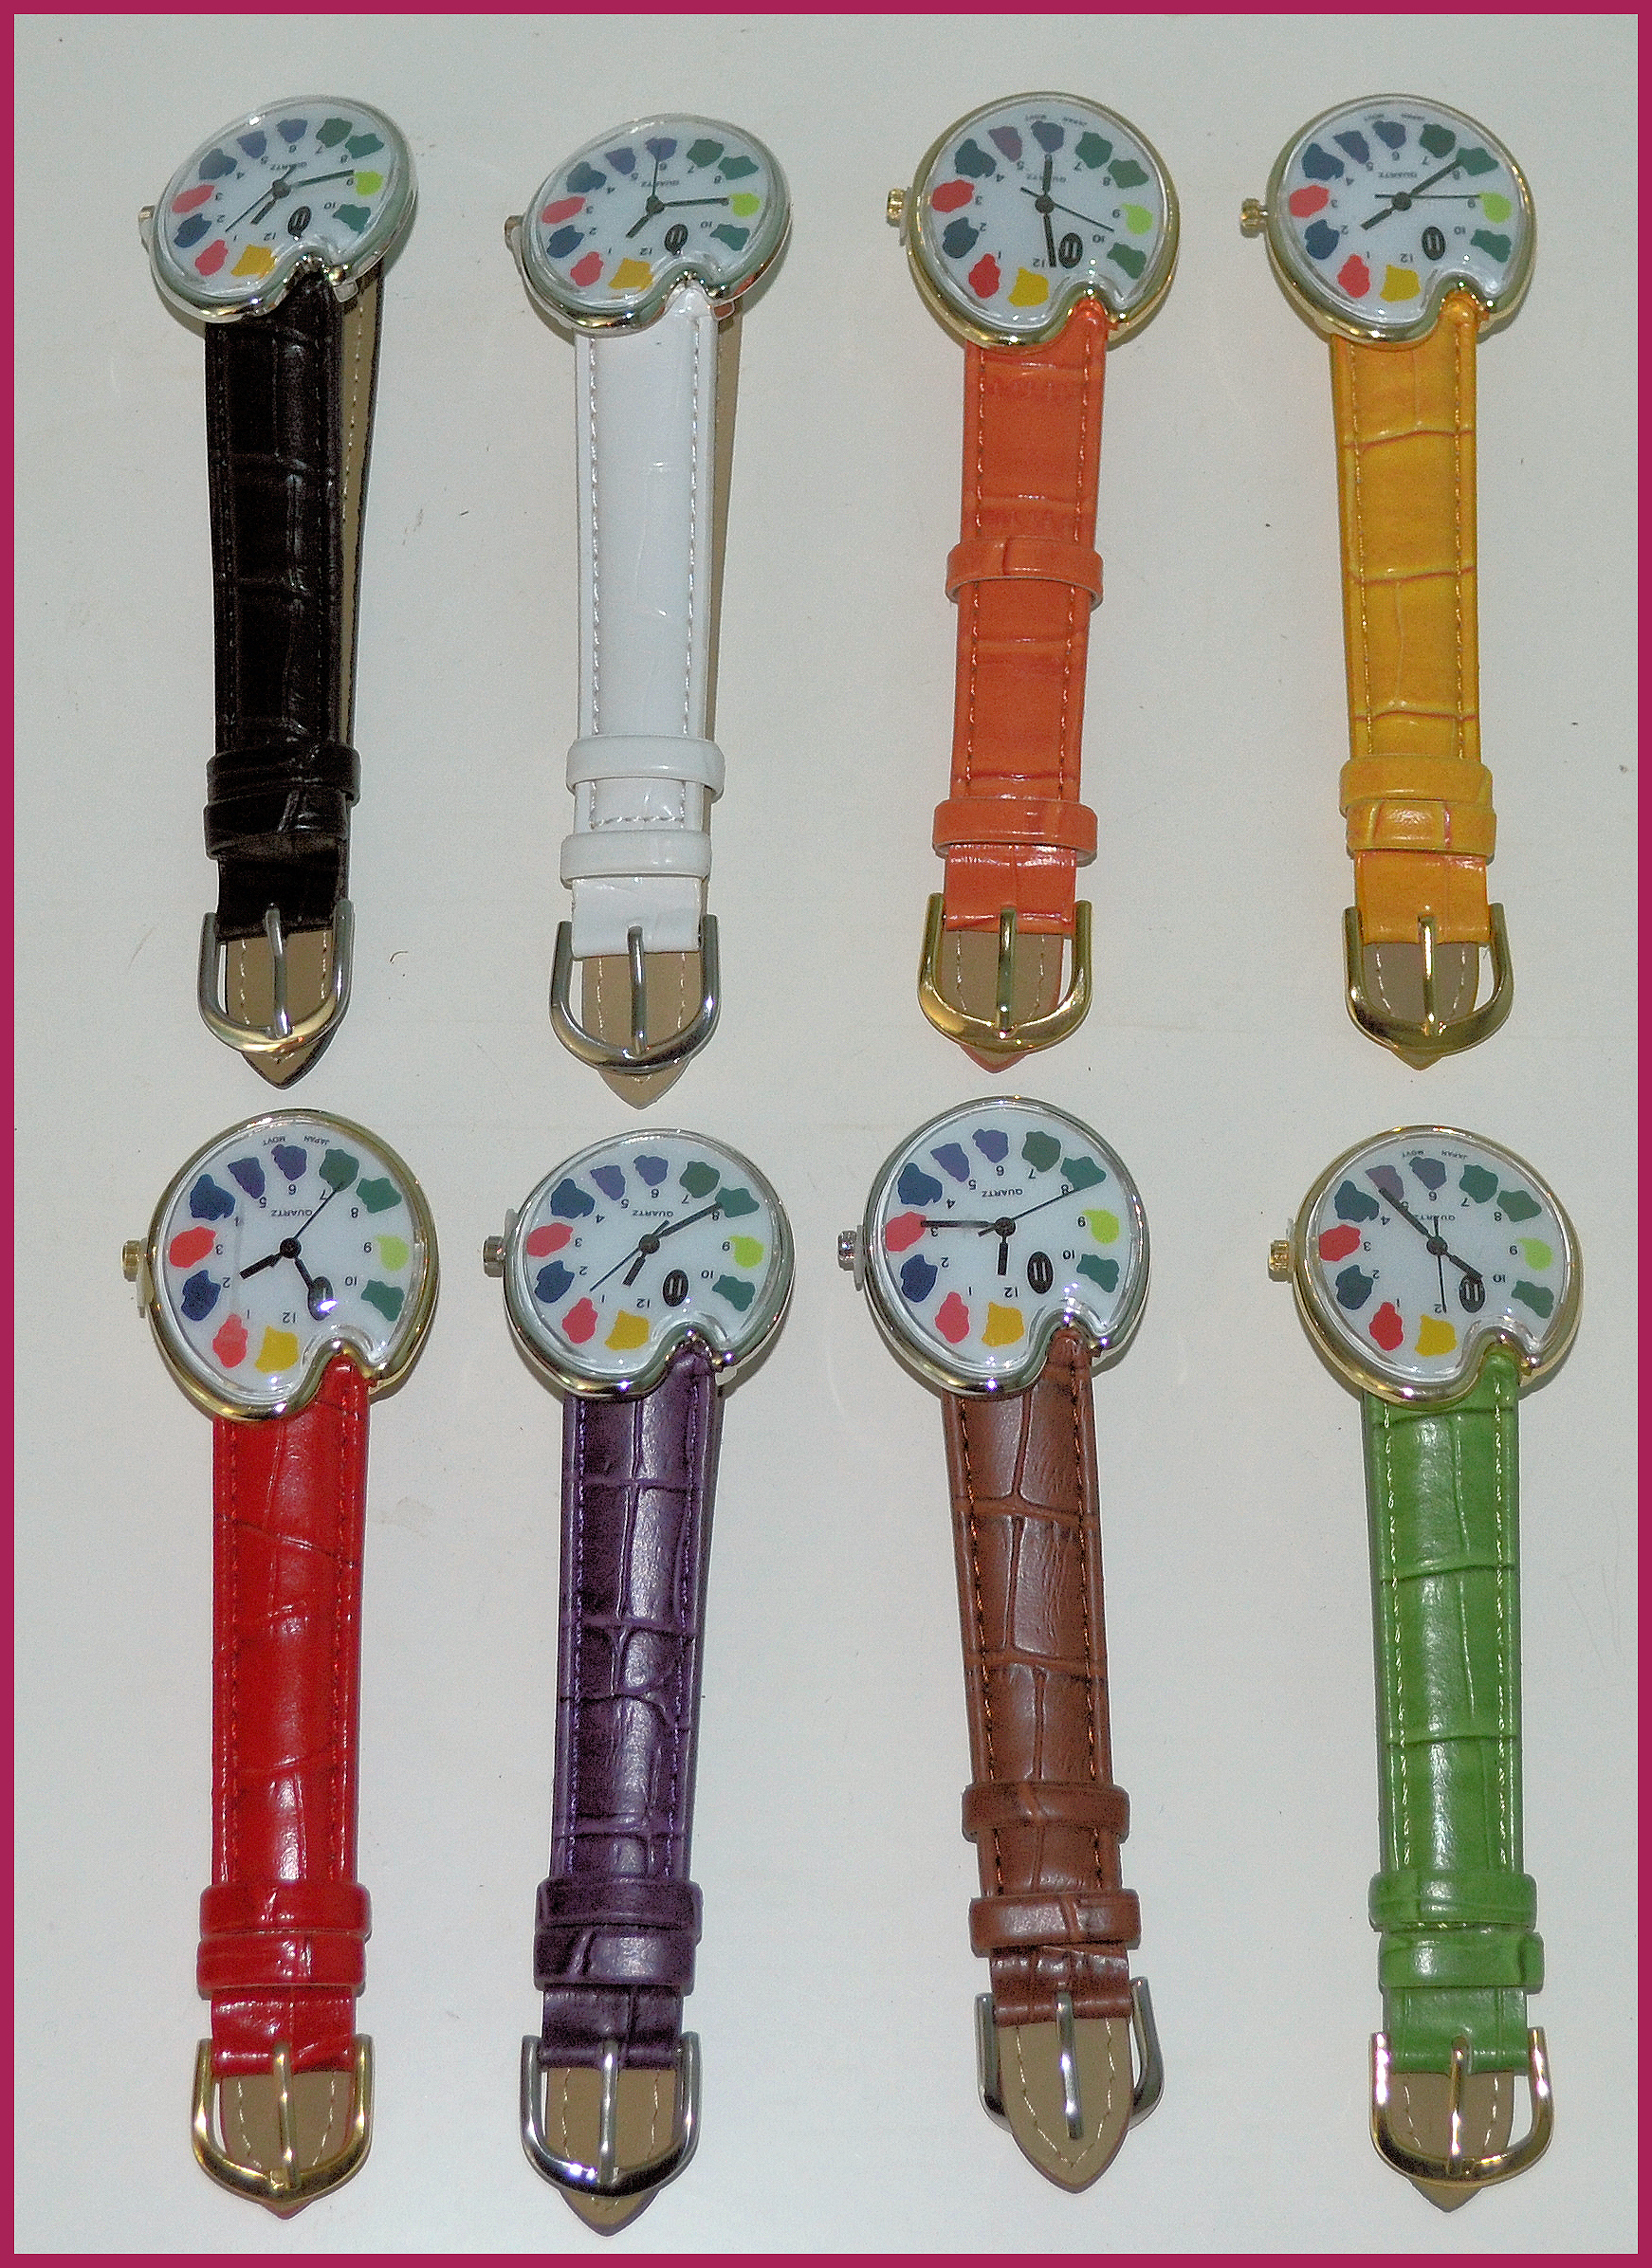 jewelry-palette-watches-20180726-3.jpg